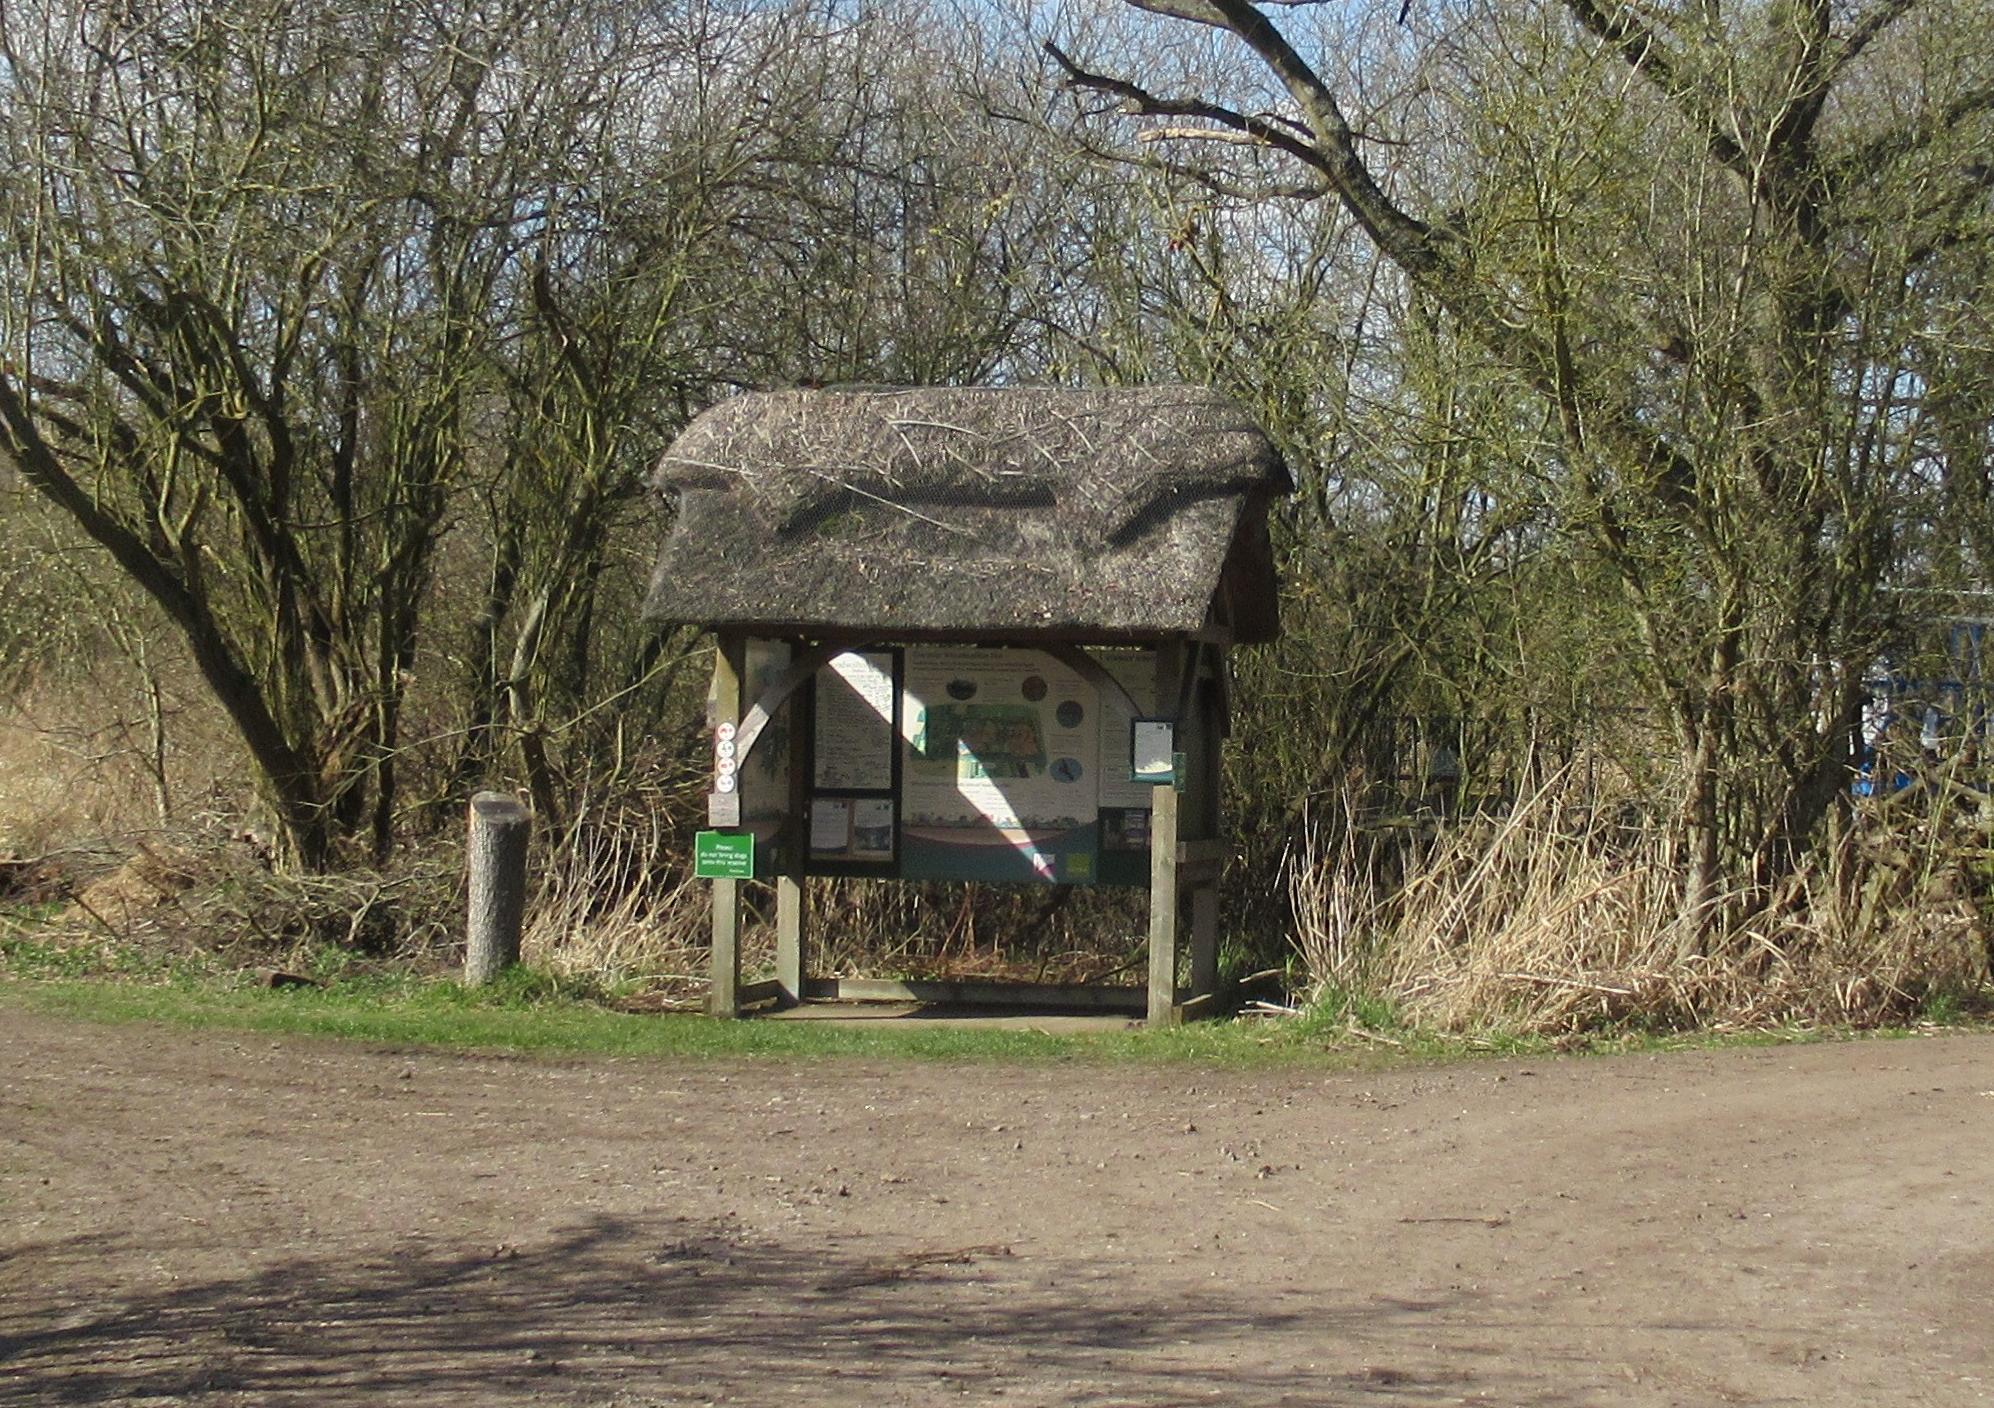 Woodwalton Fen Information Centre